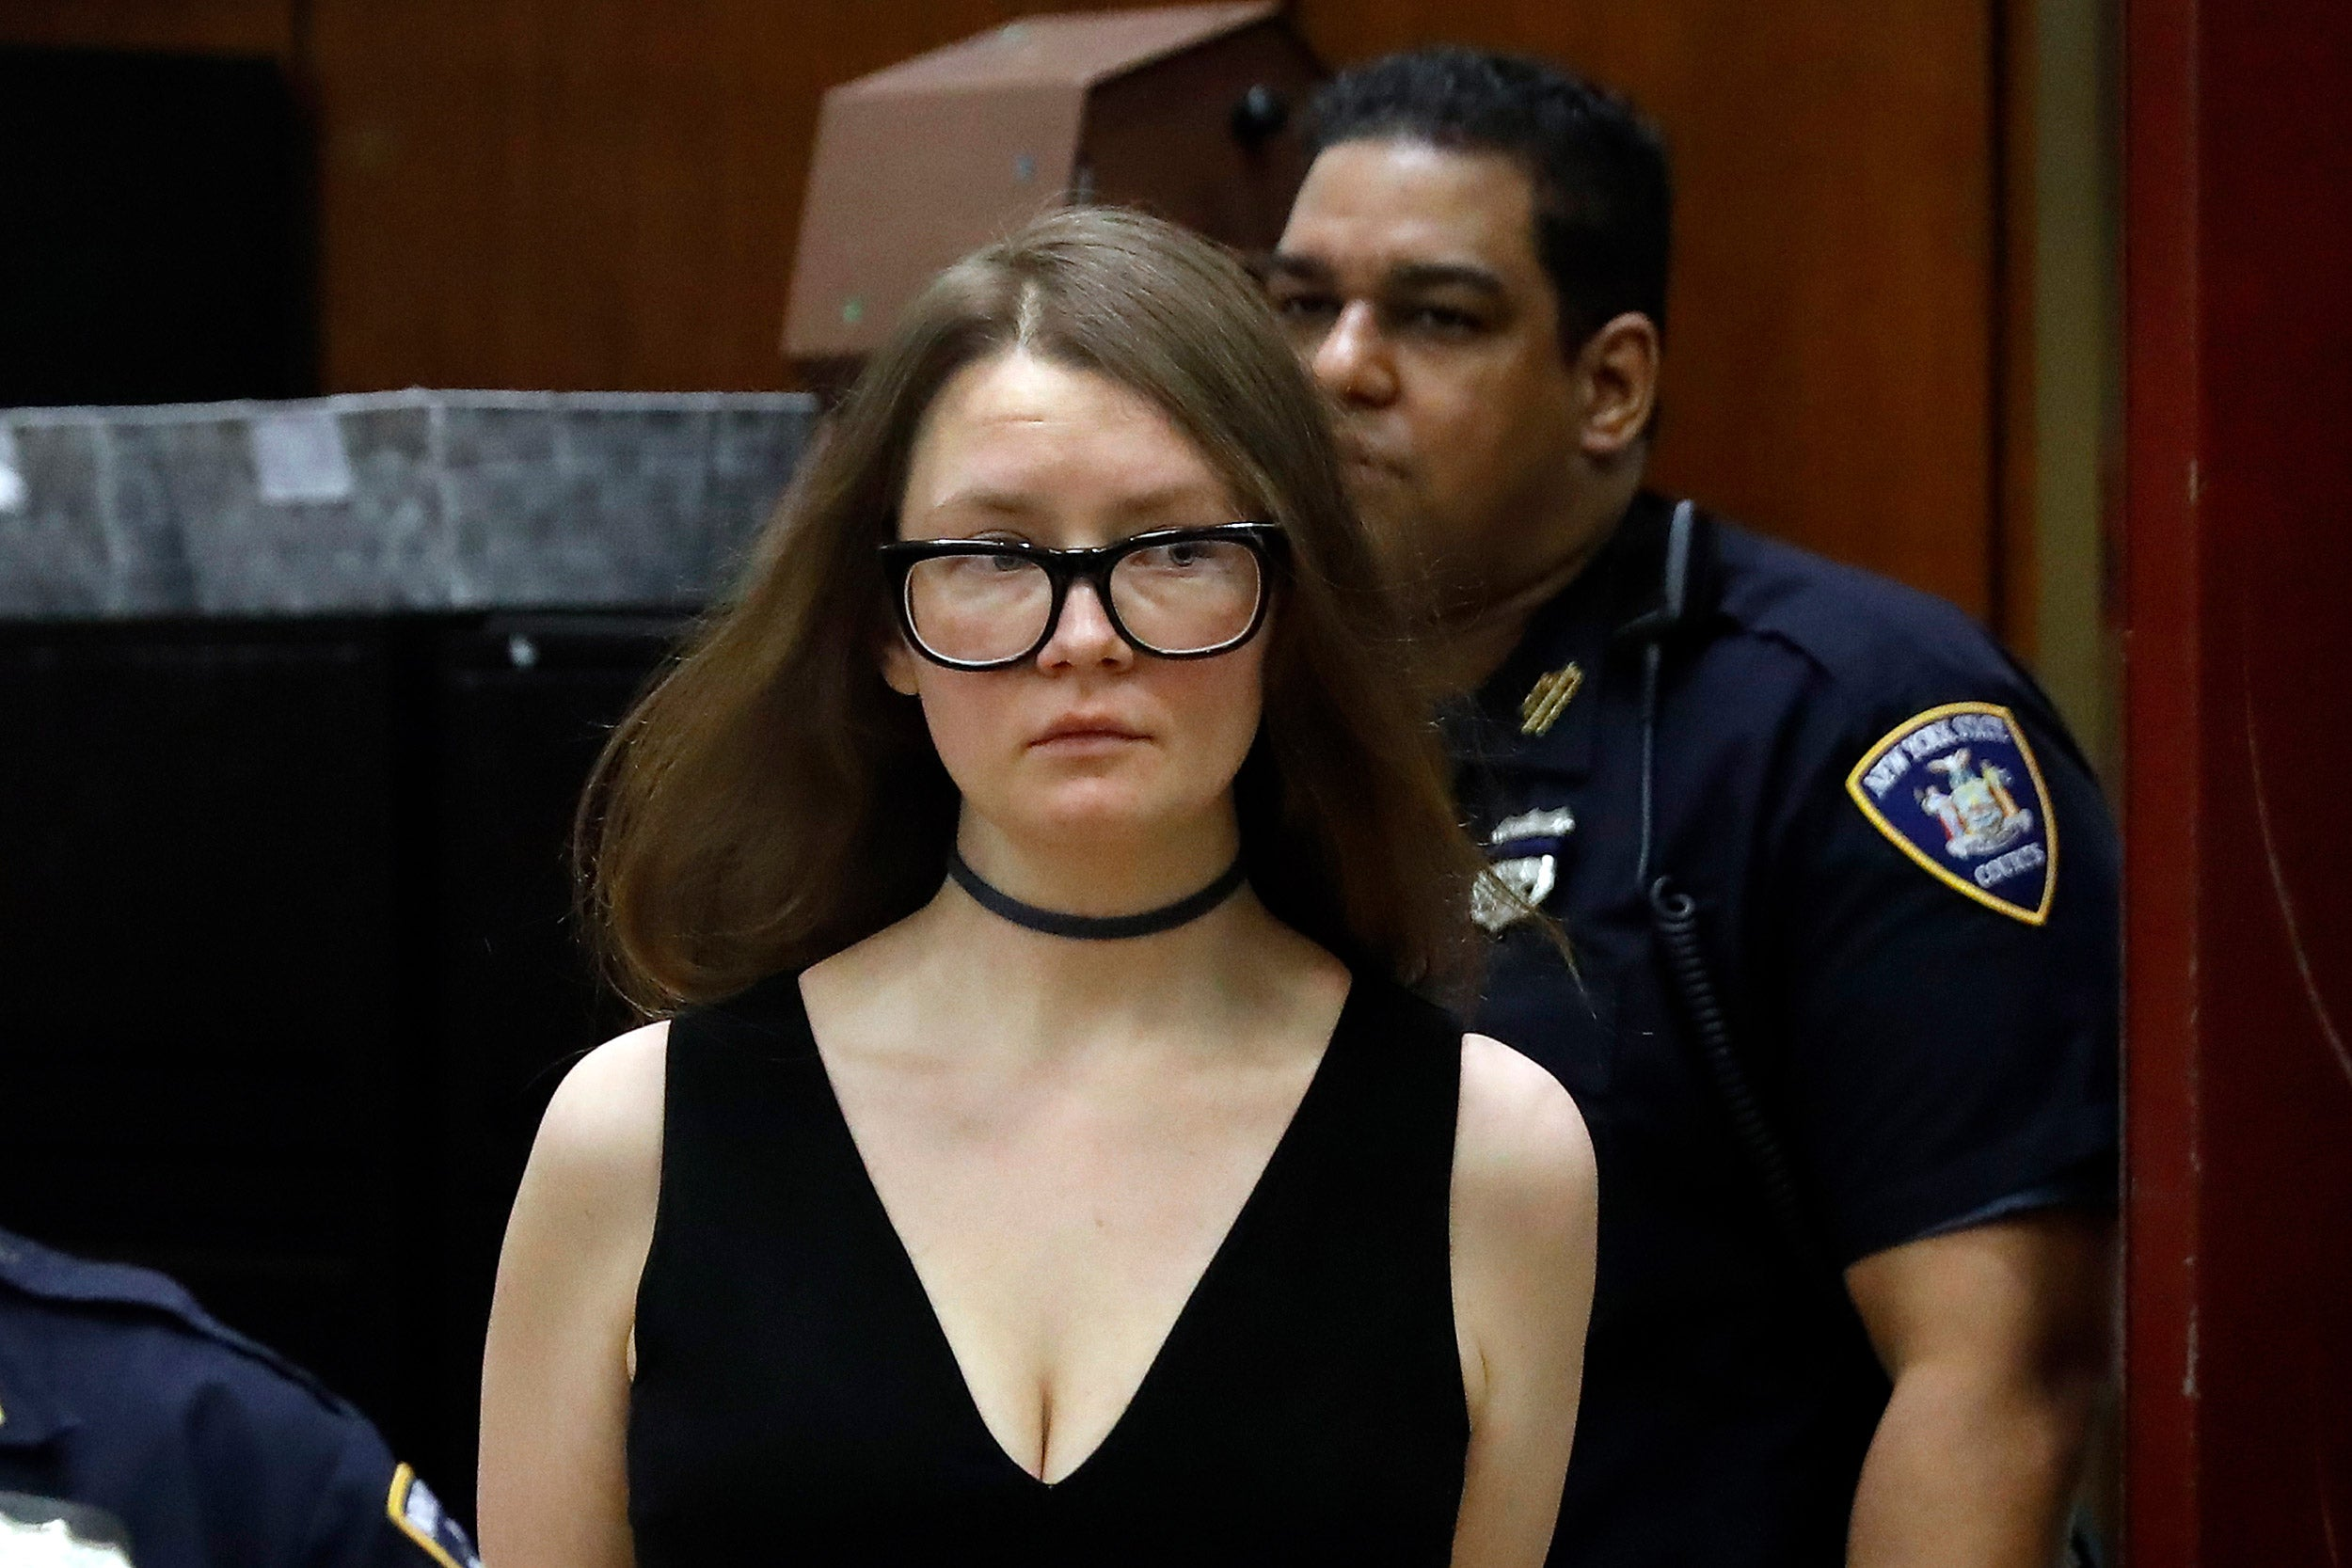 Anna Sorokin in court.